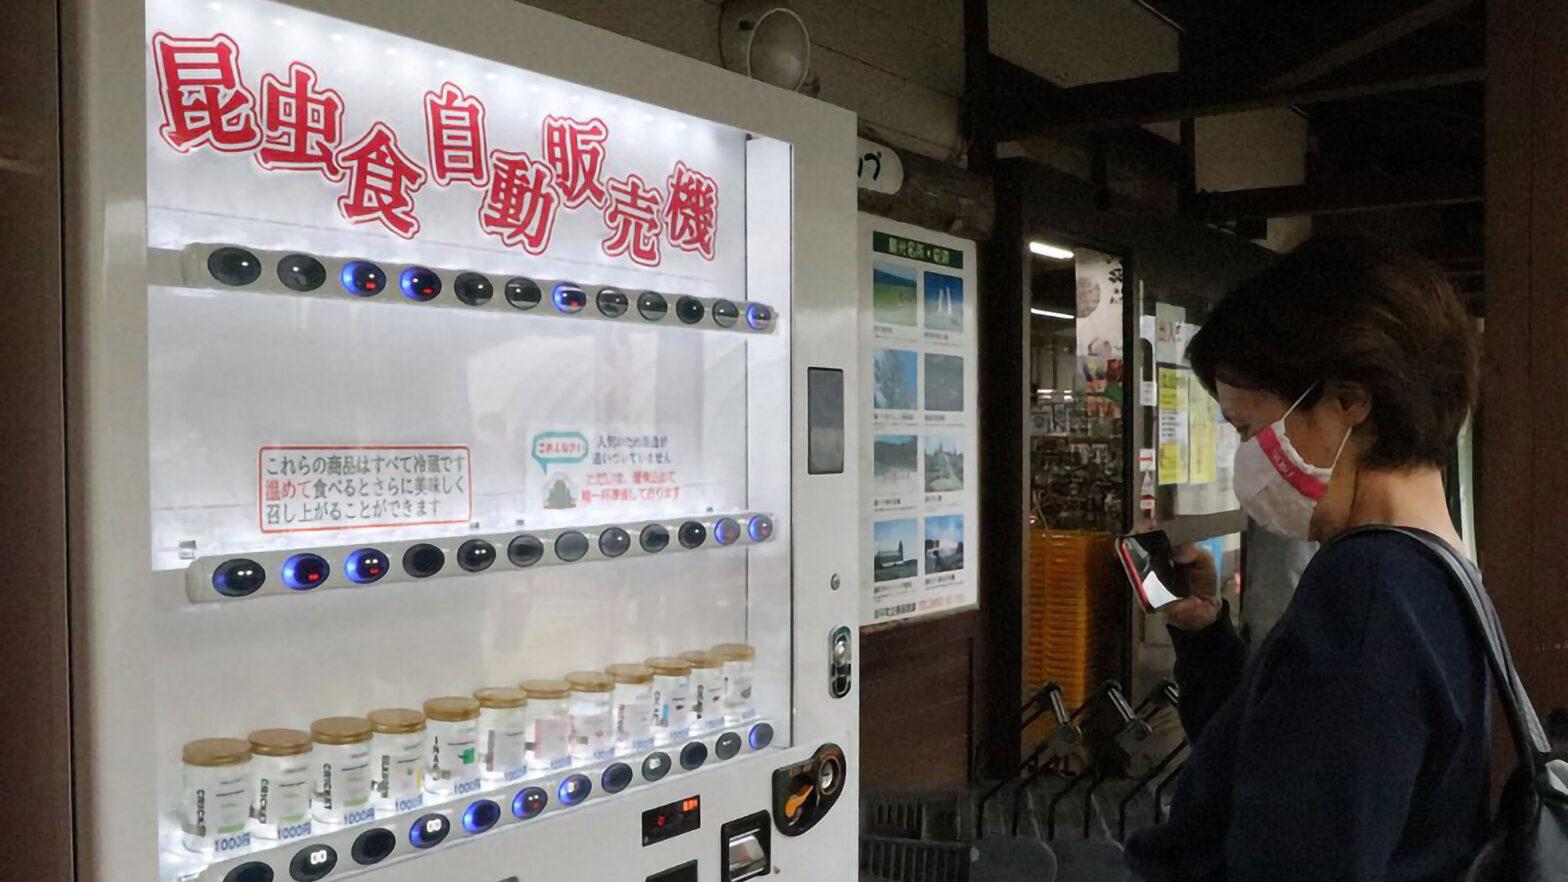 Art Studio Wao Insect Snacks Vending Machine